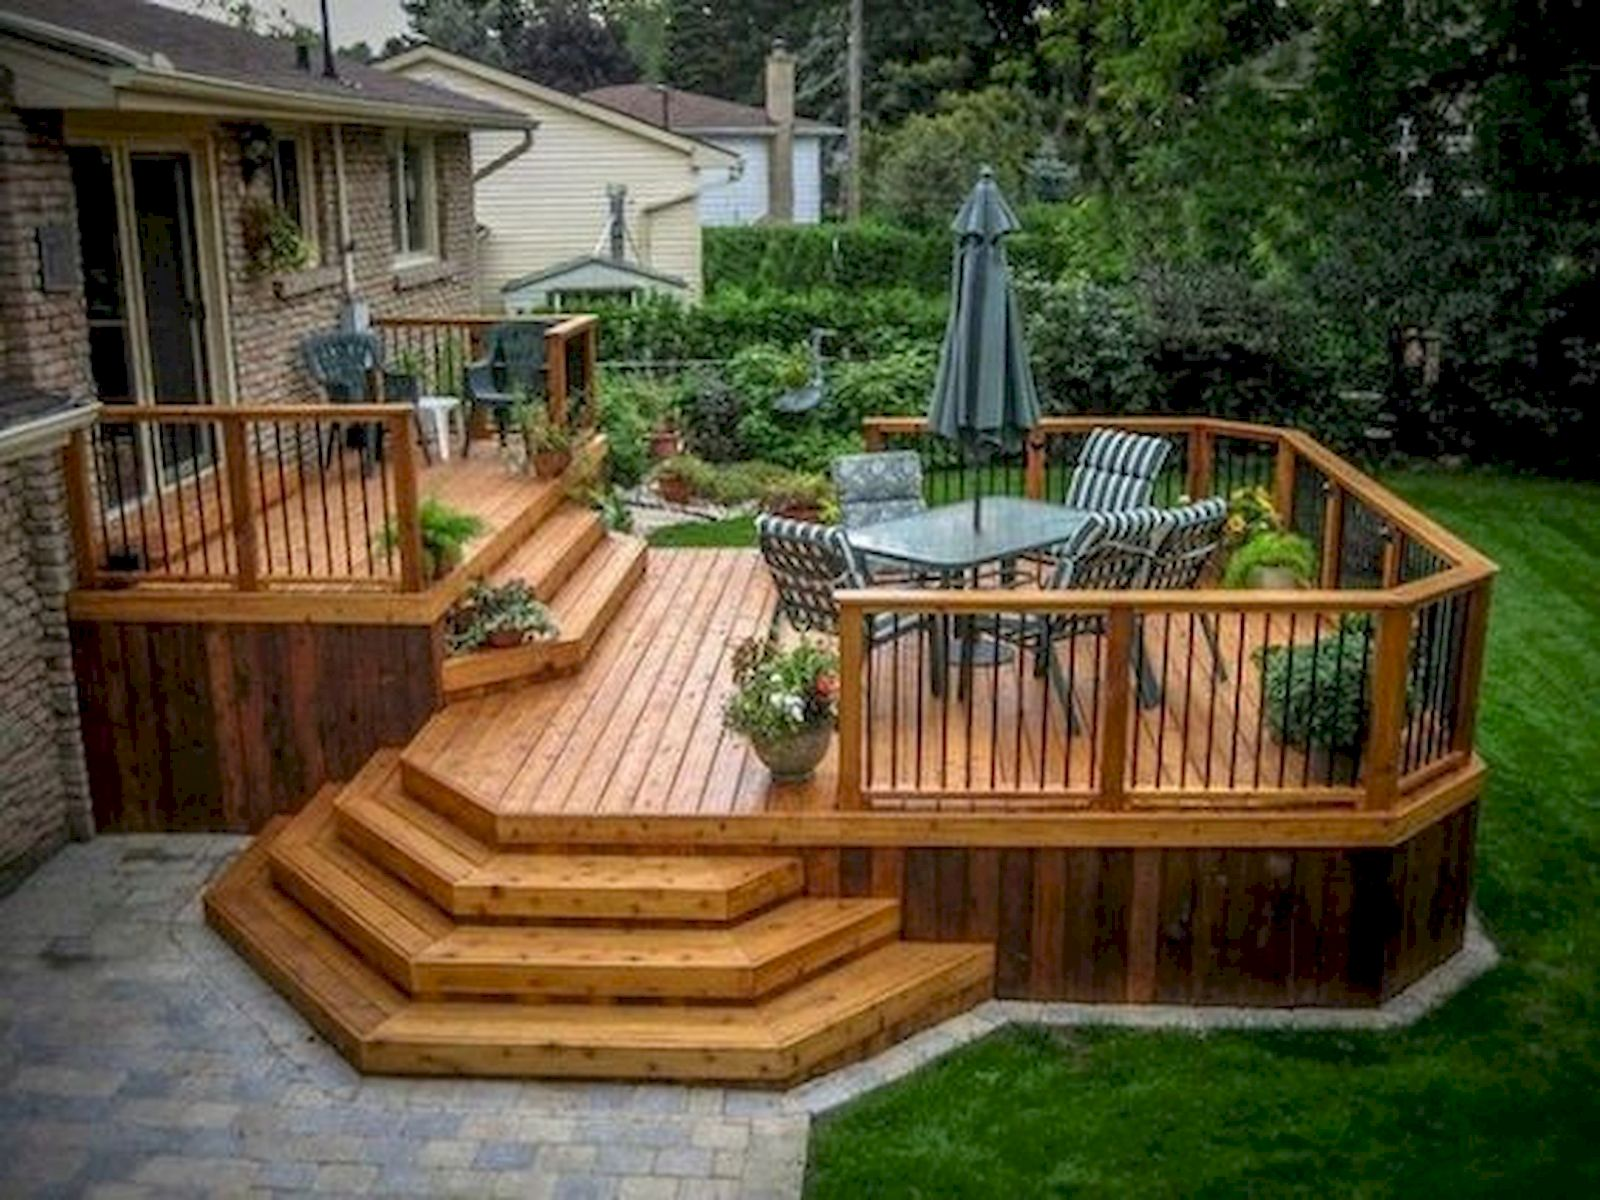 50 Best DIY Backyard Patio and Decking Design Ideas (12)